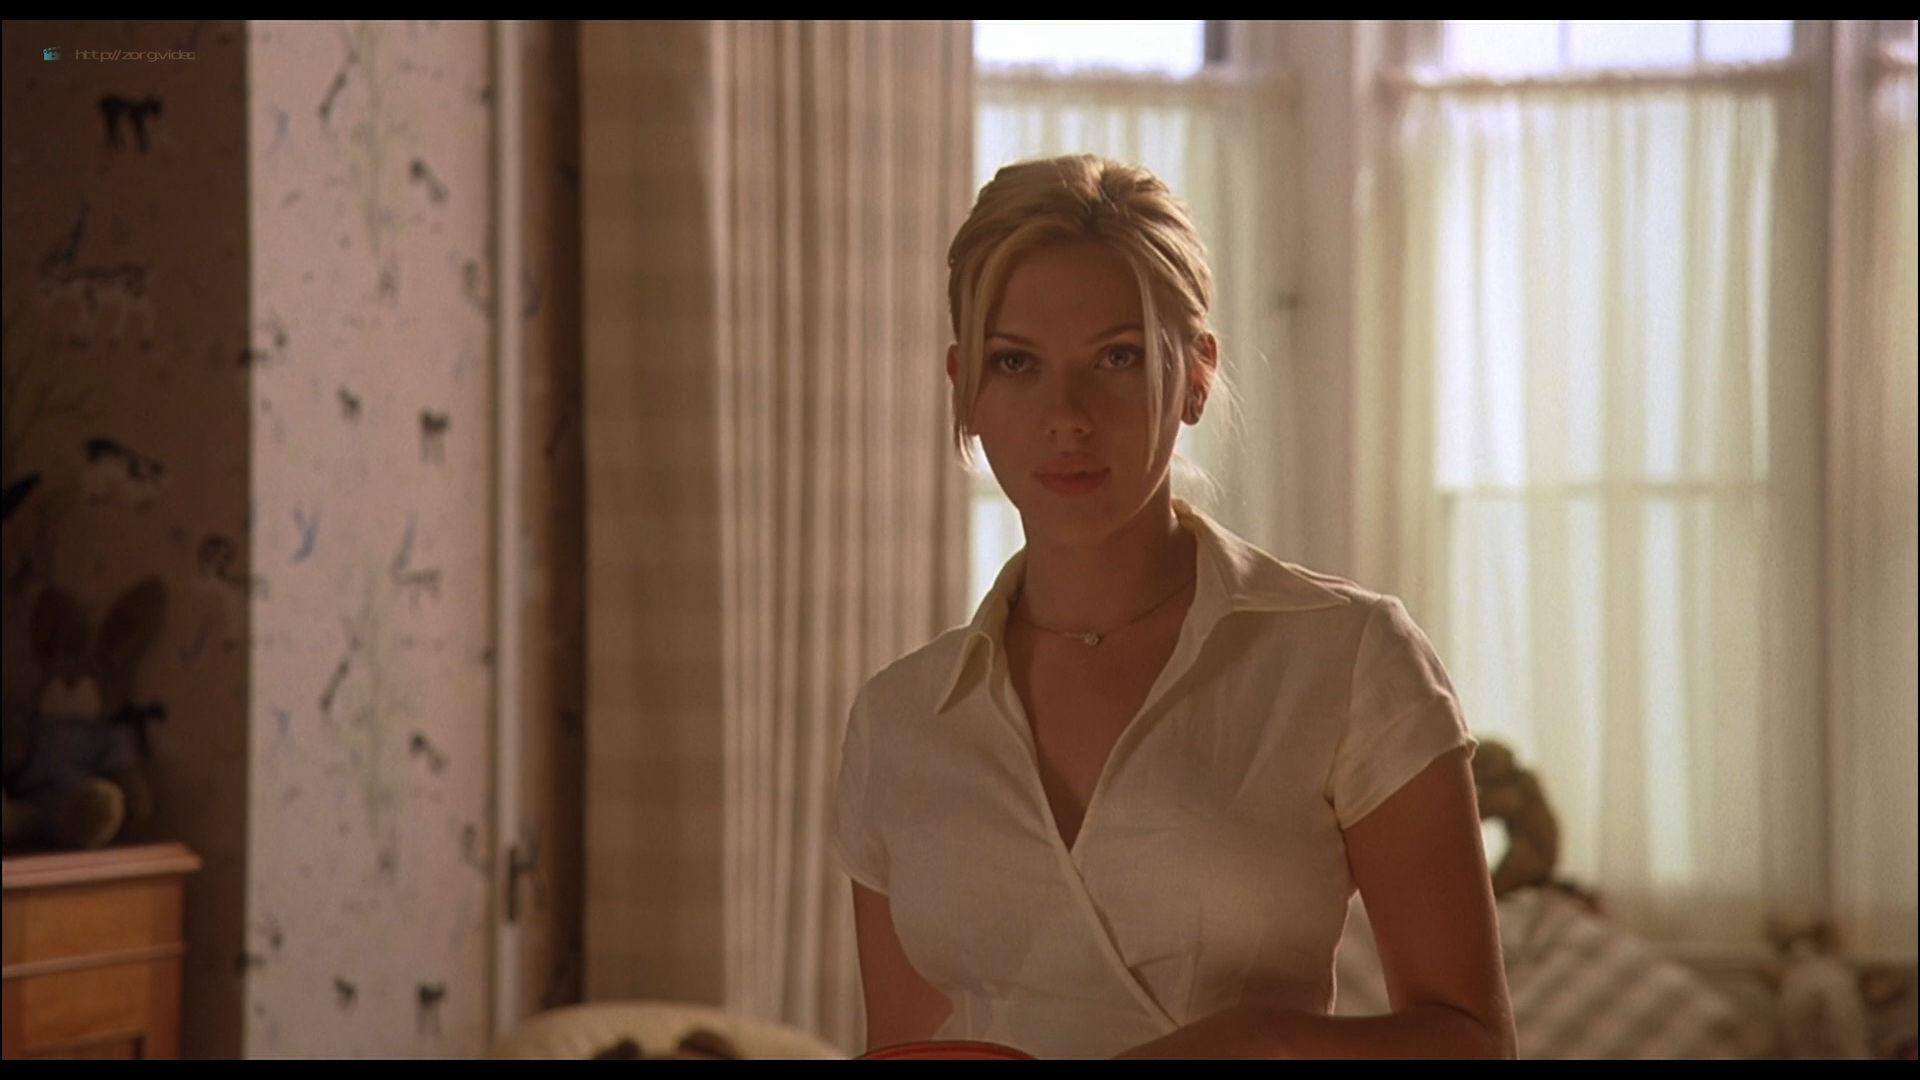 Scarlett Johansson see through and sex - Match Point (2005) HD 1080p BluRay (20)